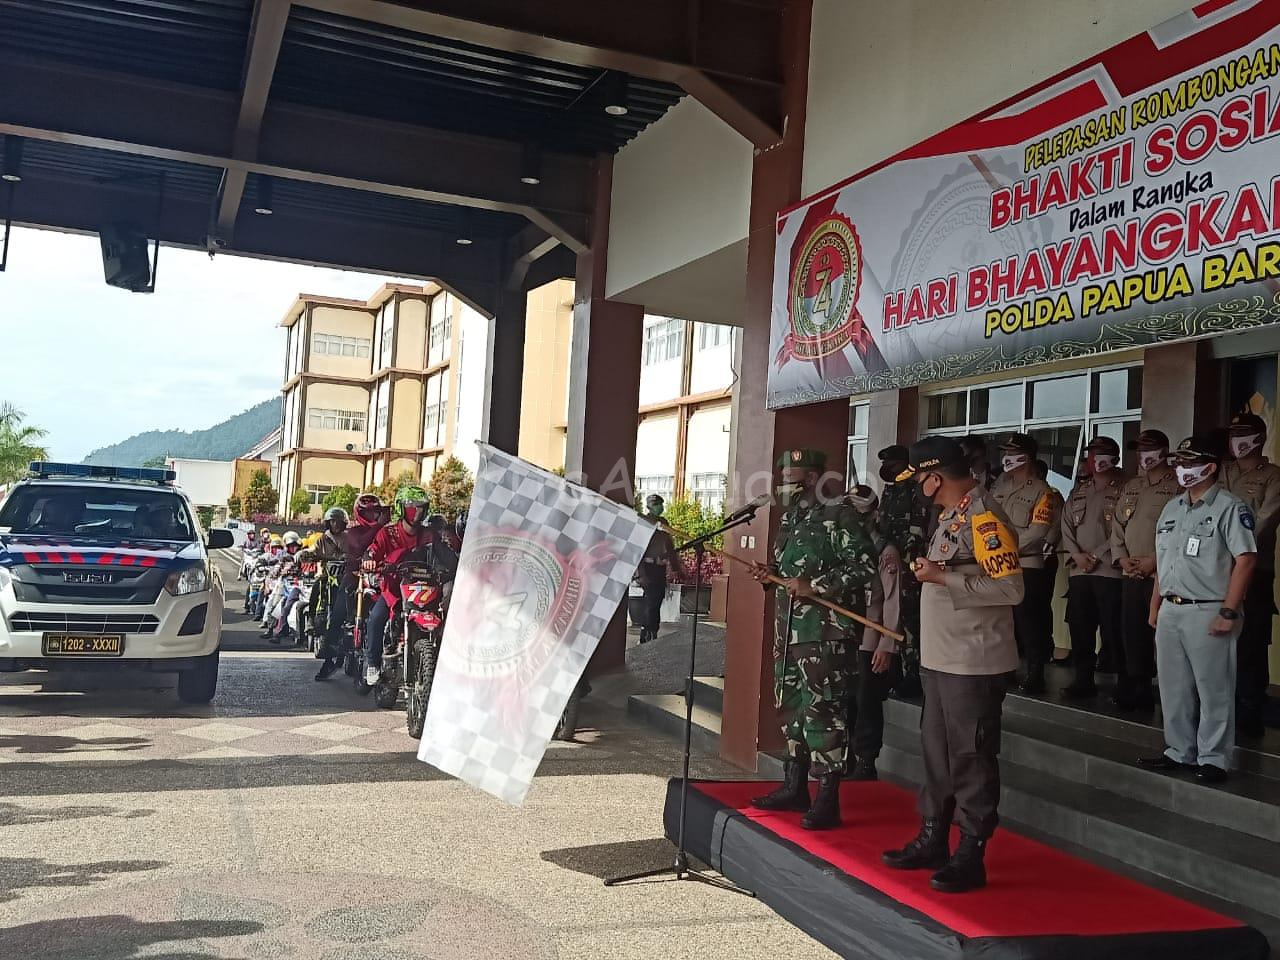 Polda Papua Barat Bagi Sembako Untuk TKBM, Ojek Dan Tenaga Medis Manokwari 1 IMG 20200626 WA0023